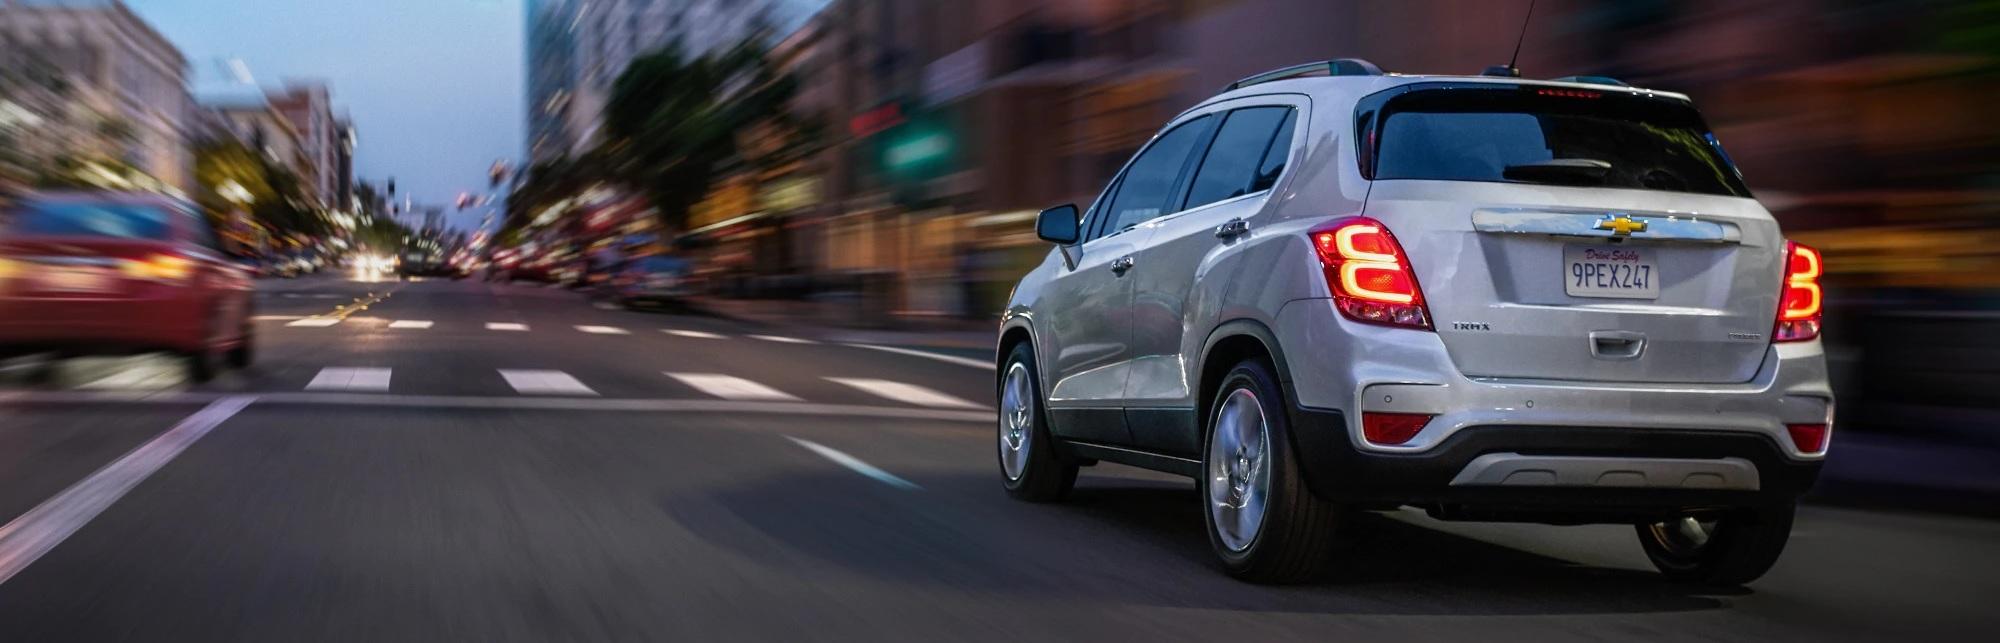 2020 Chevrolet Trax Key Features near Detroit, MI